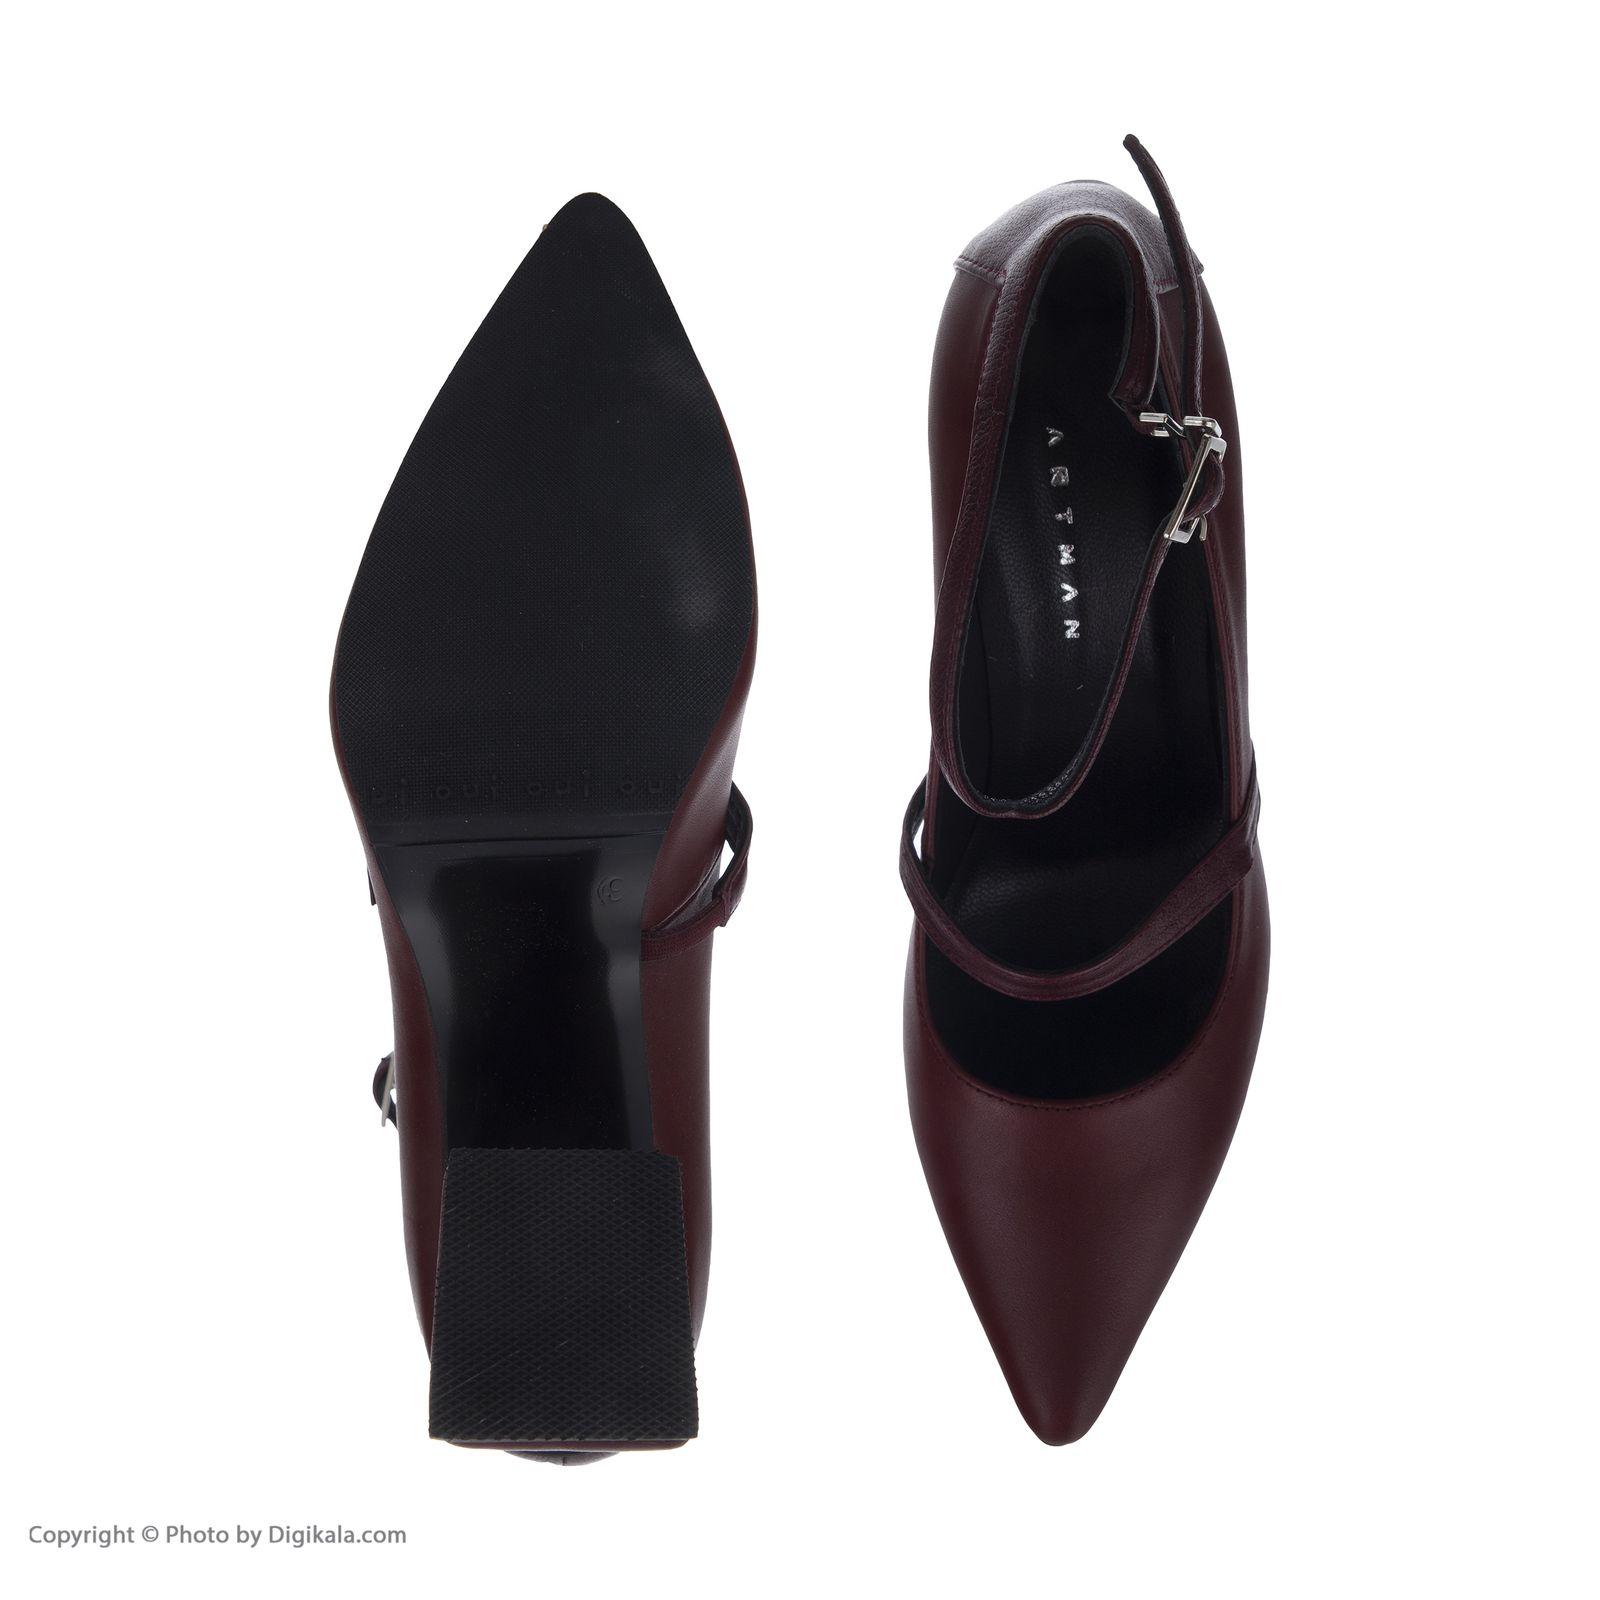 کفش زنانه آرتمن مدل Merry-41176 -  - 4